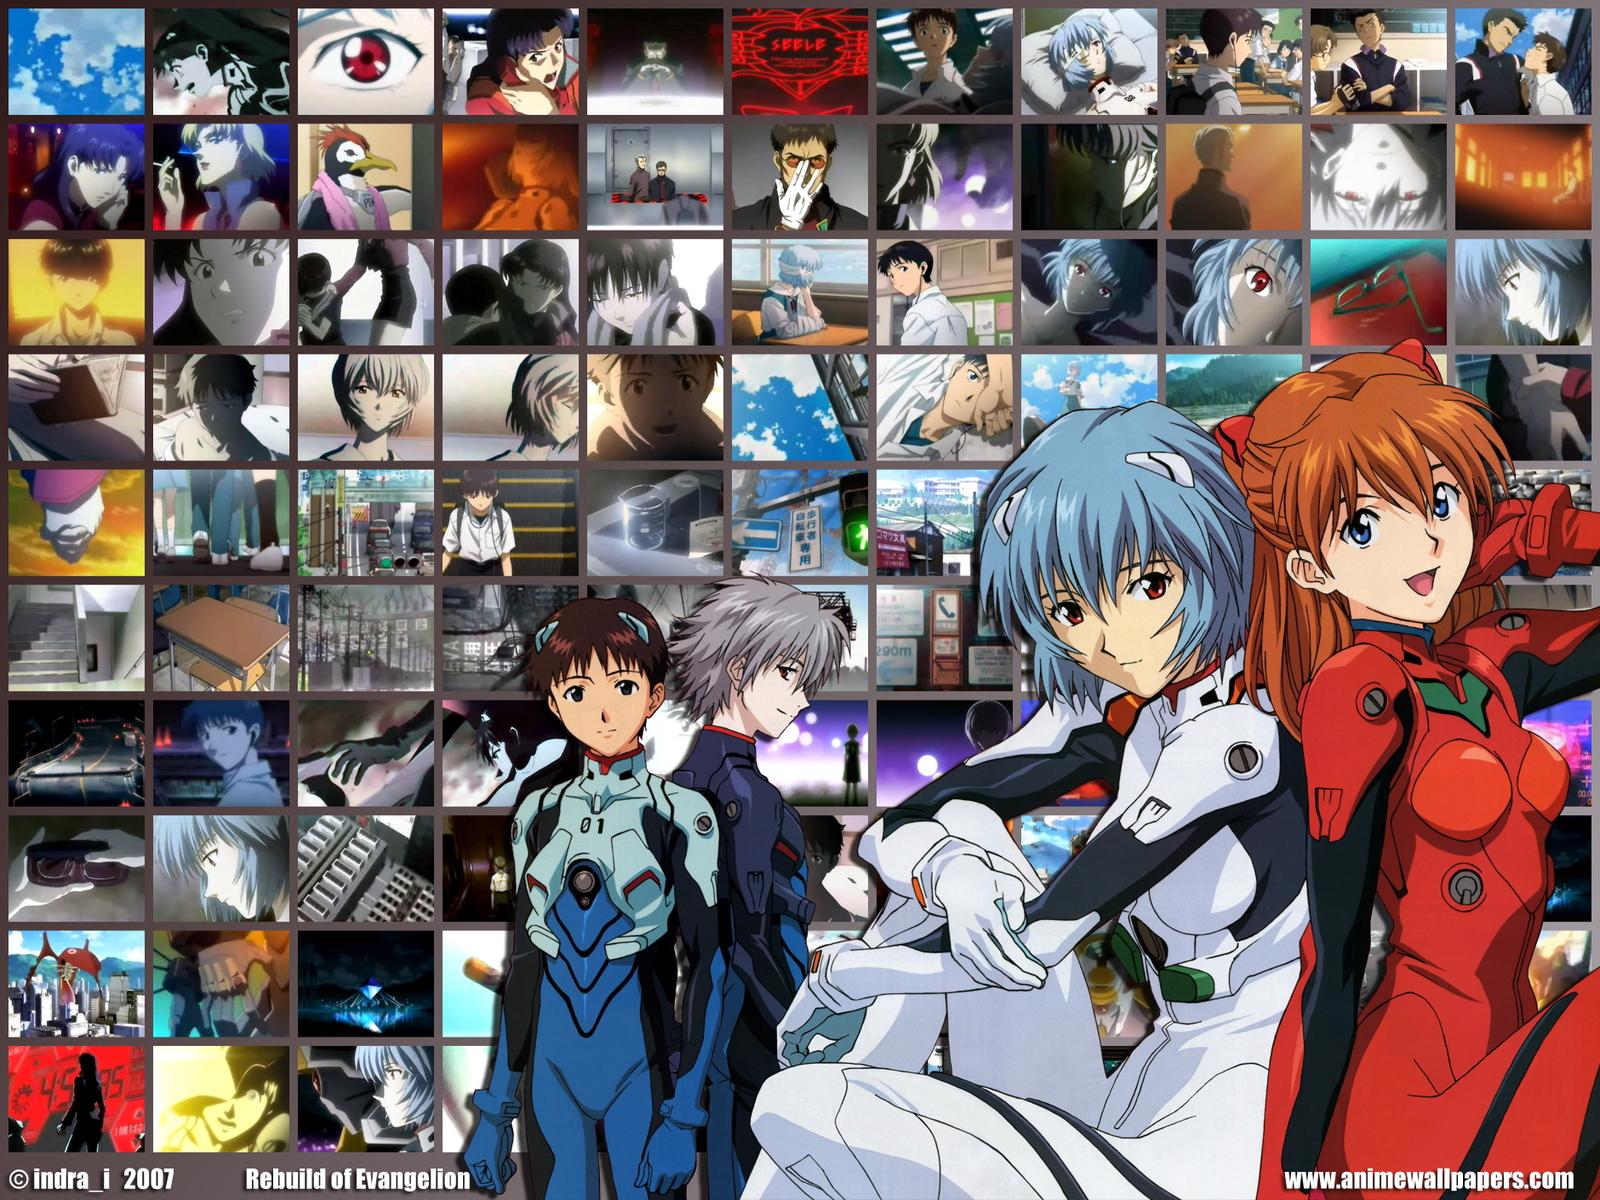 Neon Genesis Evangelion Anime Wallpaper # 137